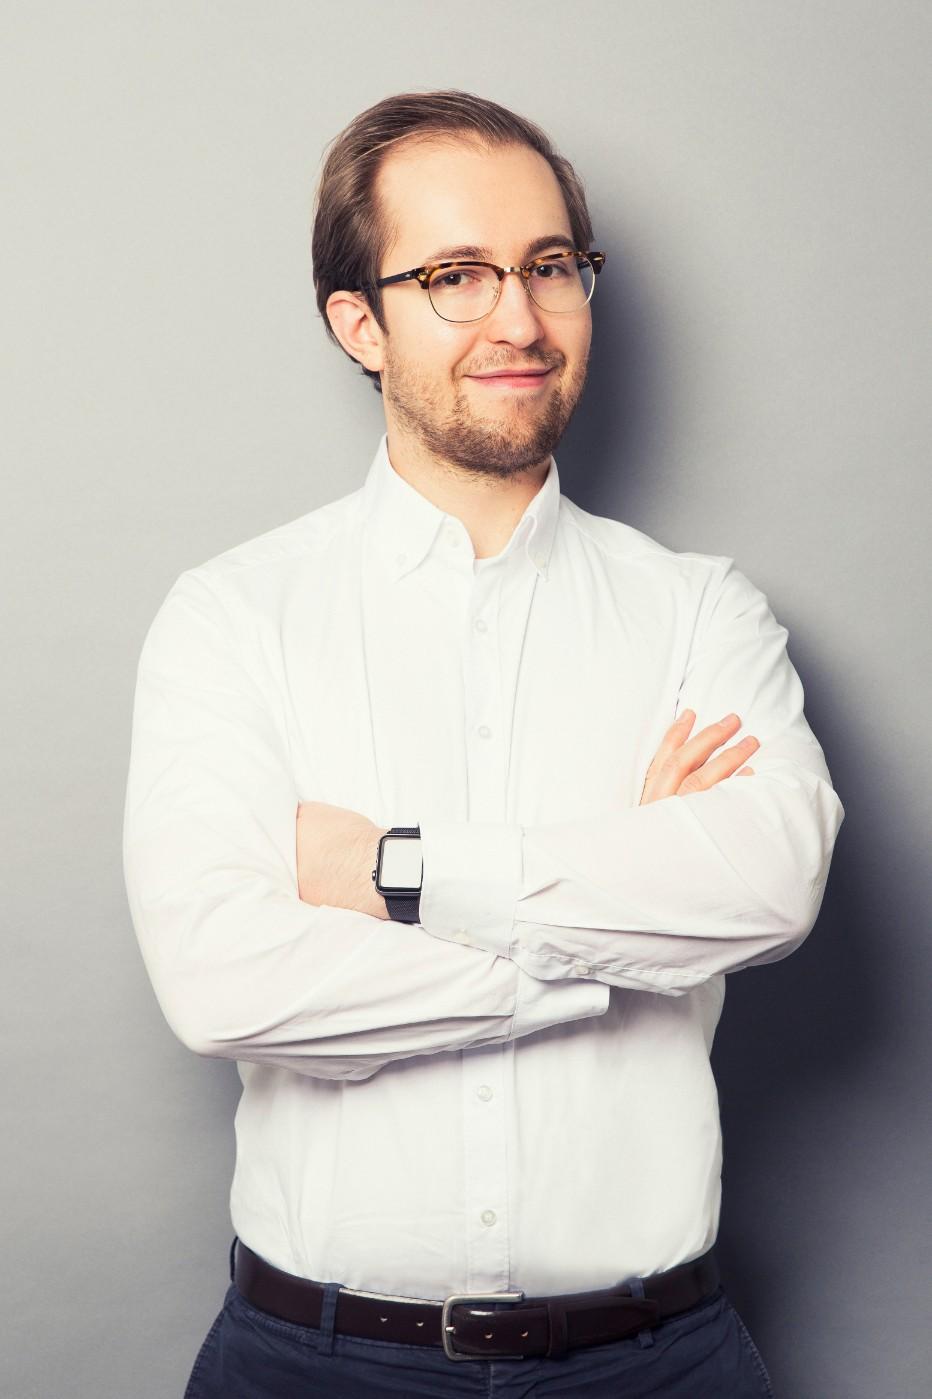 Patrick, Developer